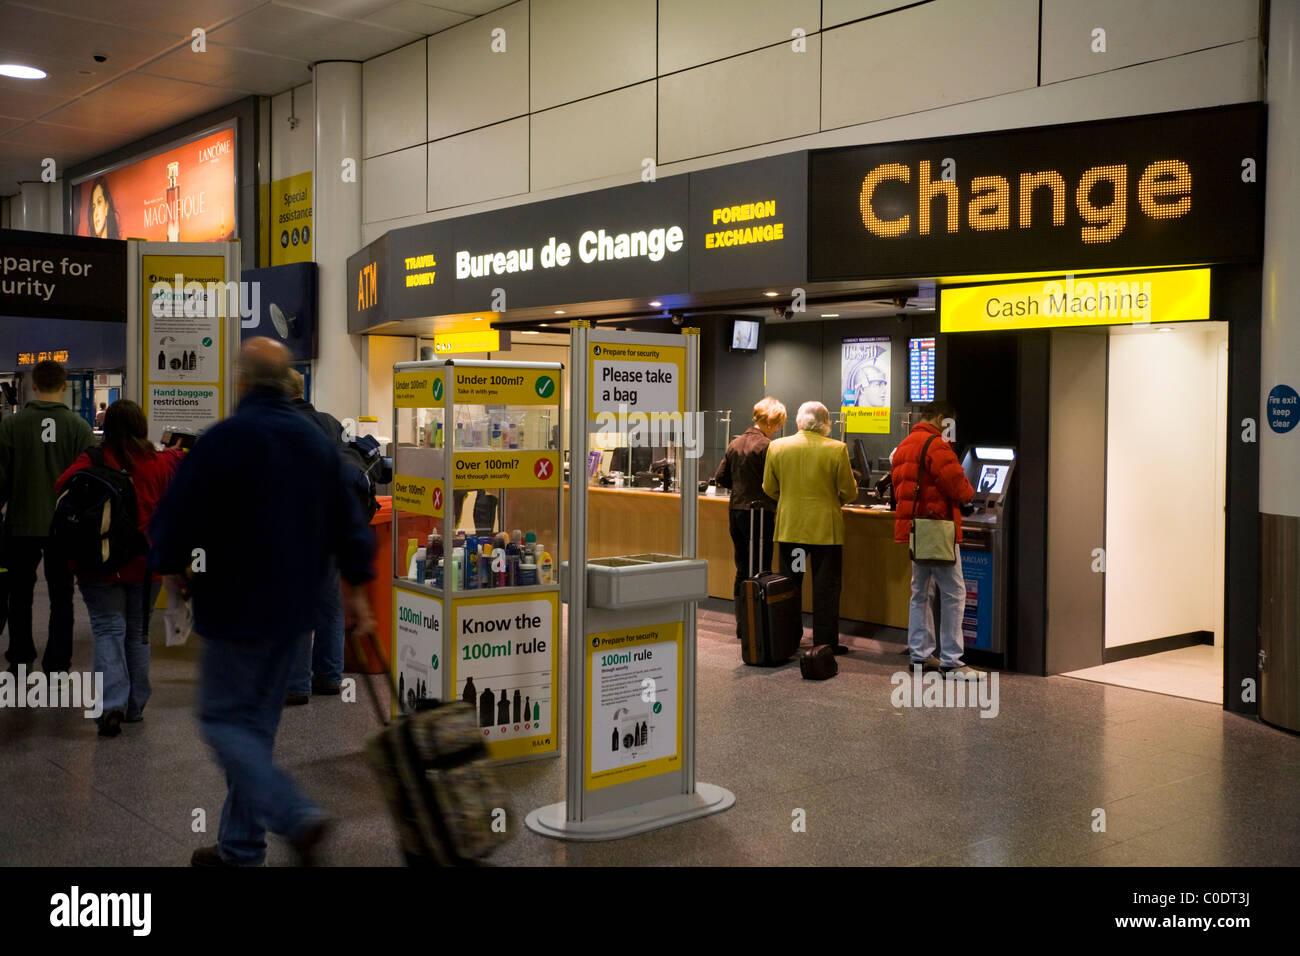 Lounge rules stock photos lounge rules stock images alamy - How do bureau de change make money ...